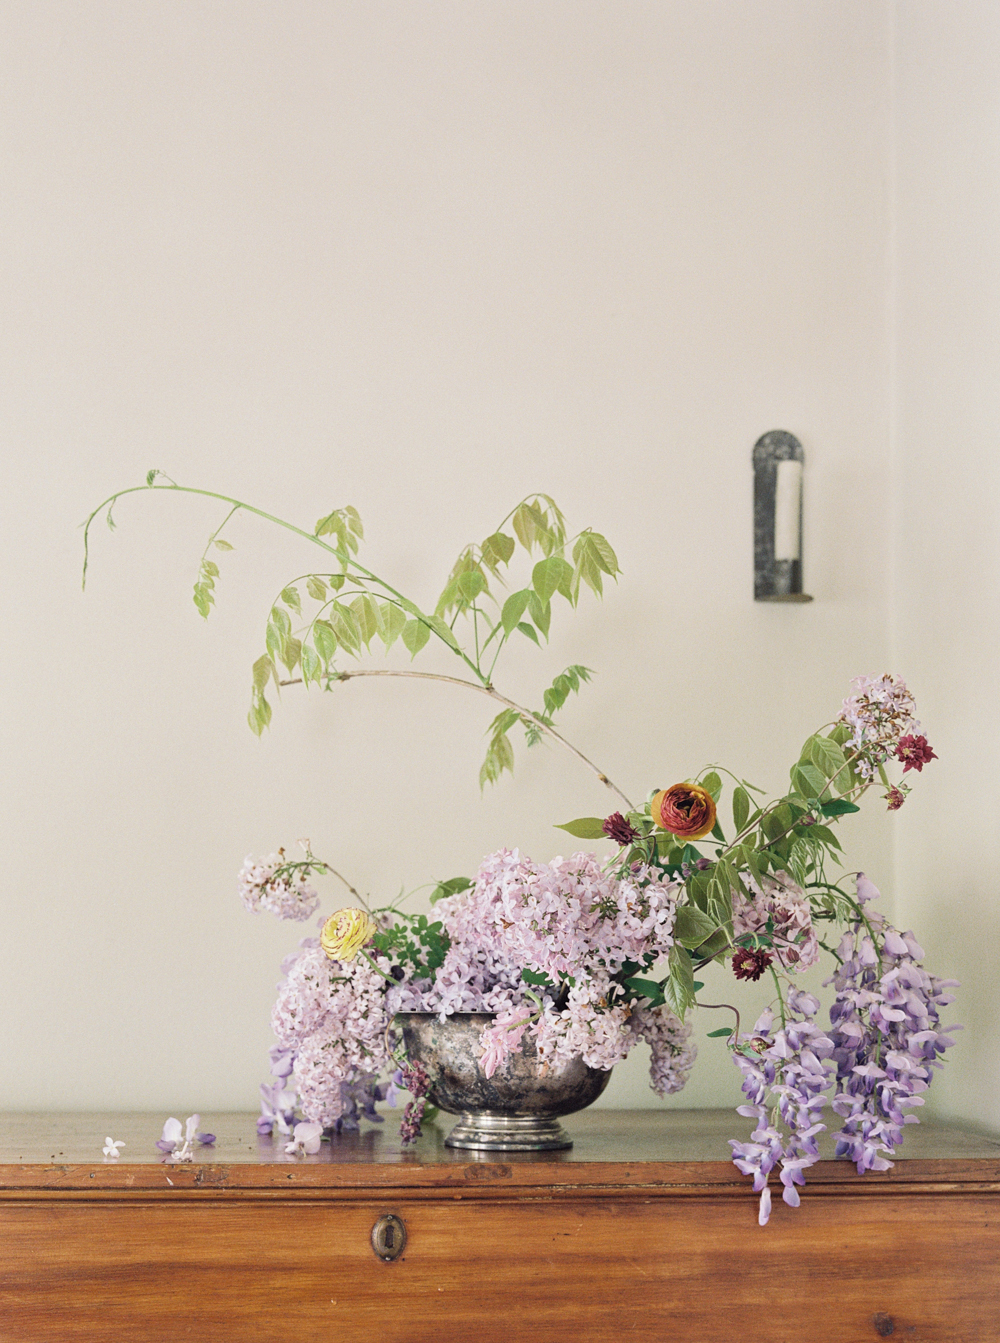 cristina-lozito-photography-flowers-36.jpg